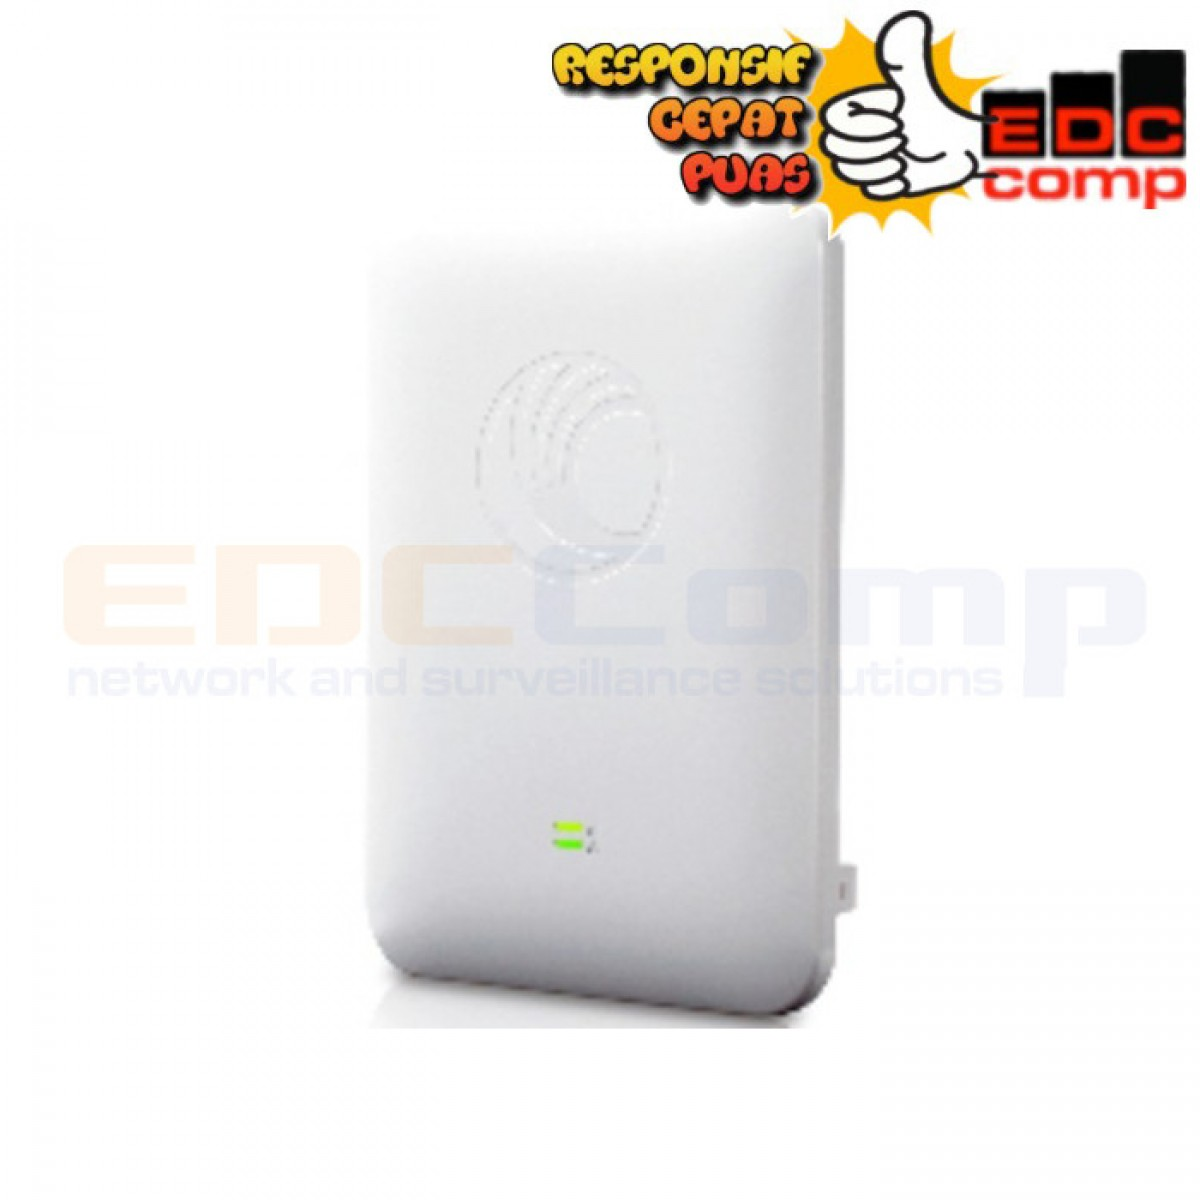 Cambium Networks cnPilot e501s Access Point - EdcComp